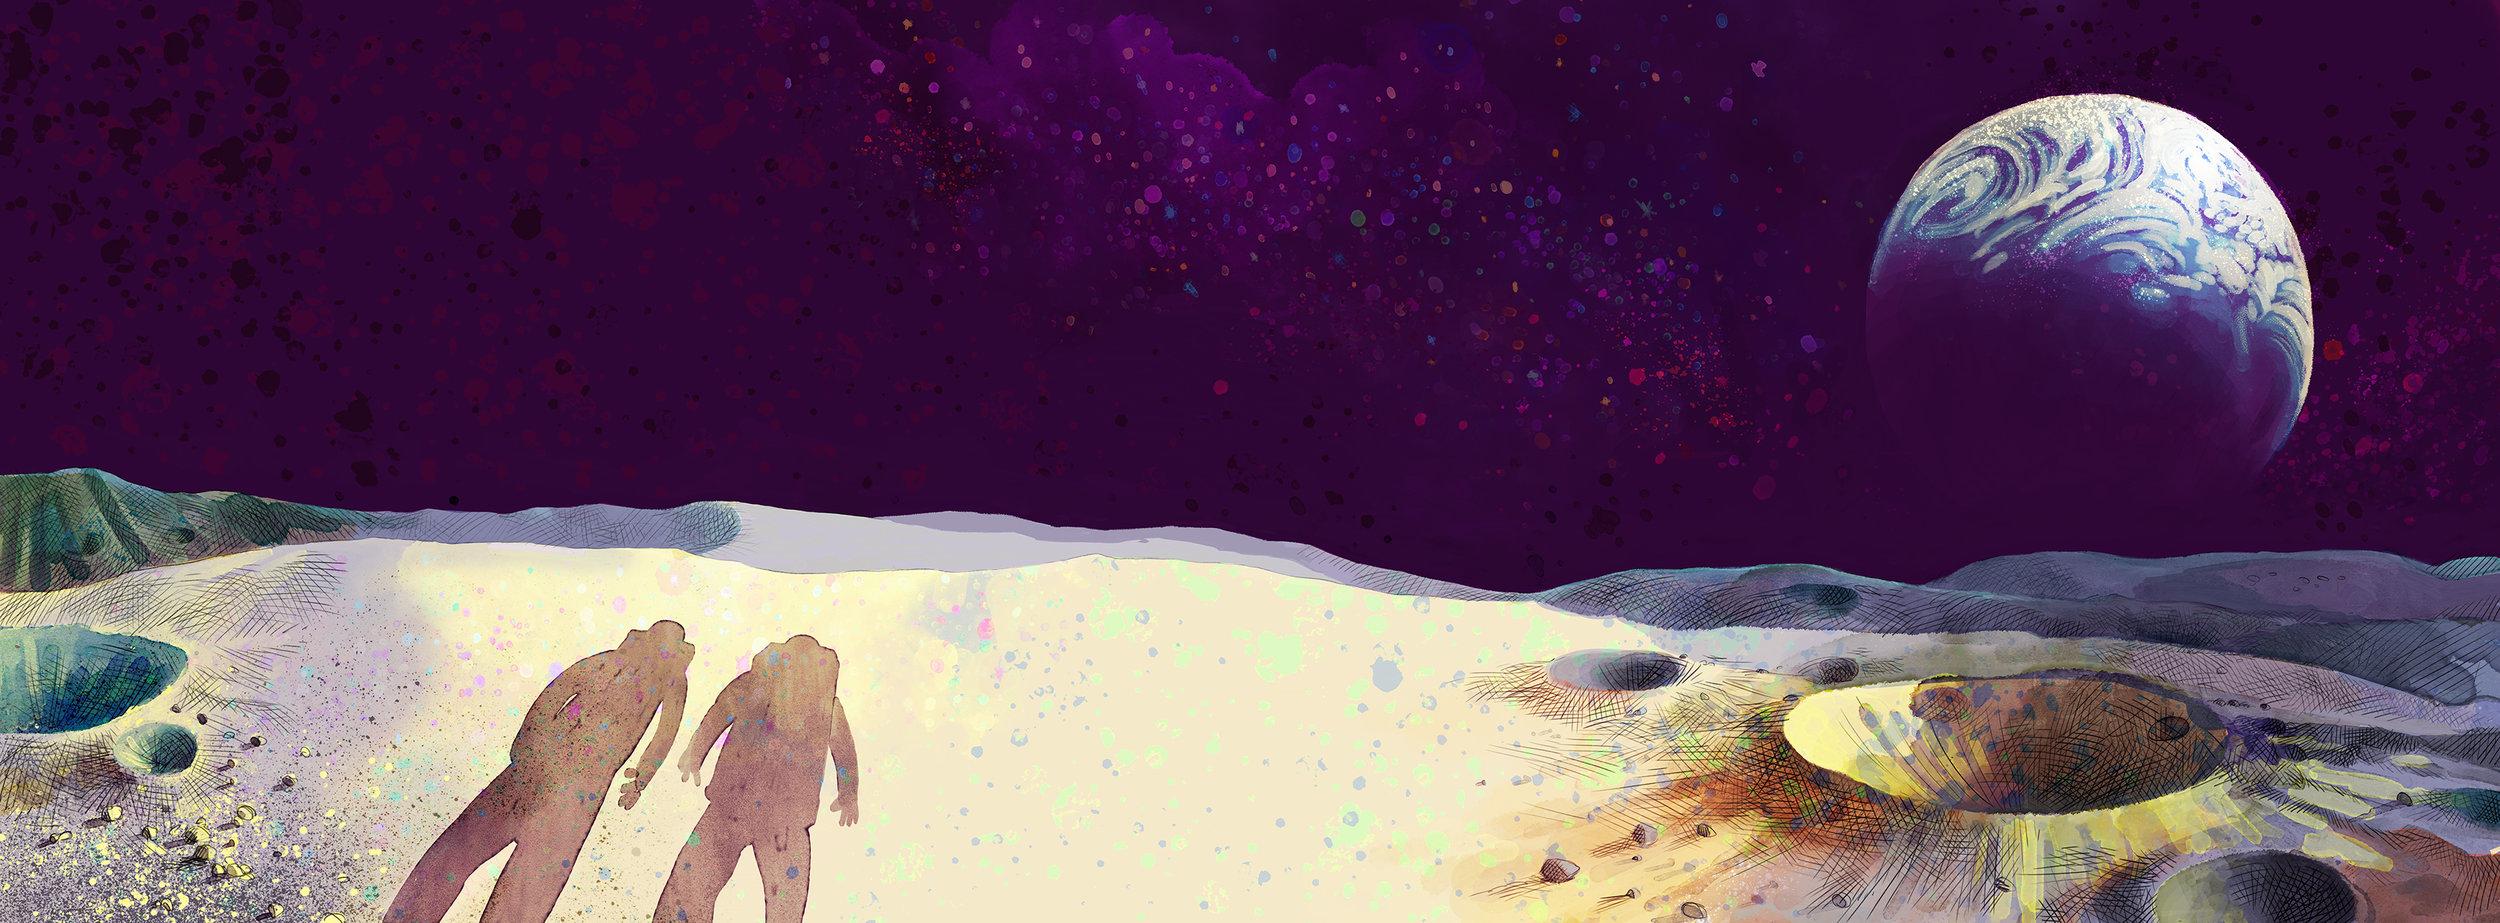 jpg moonwalk.jpg